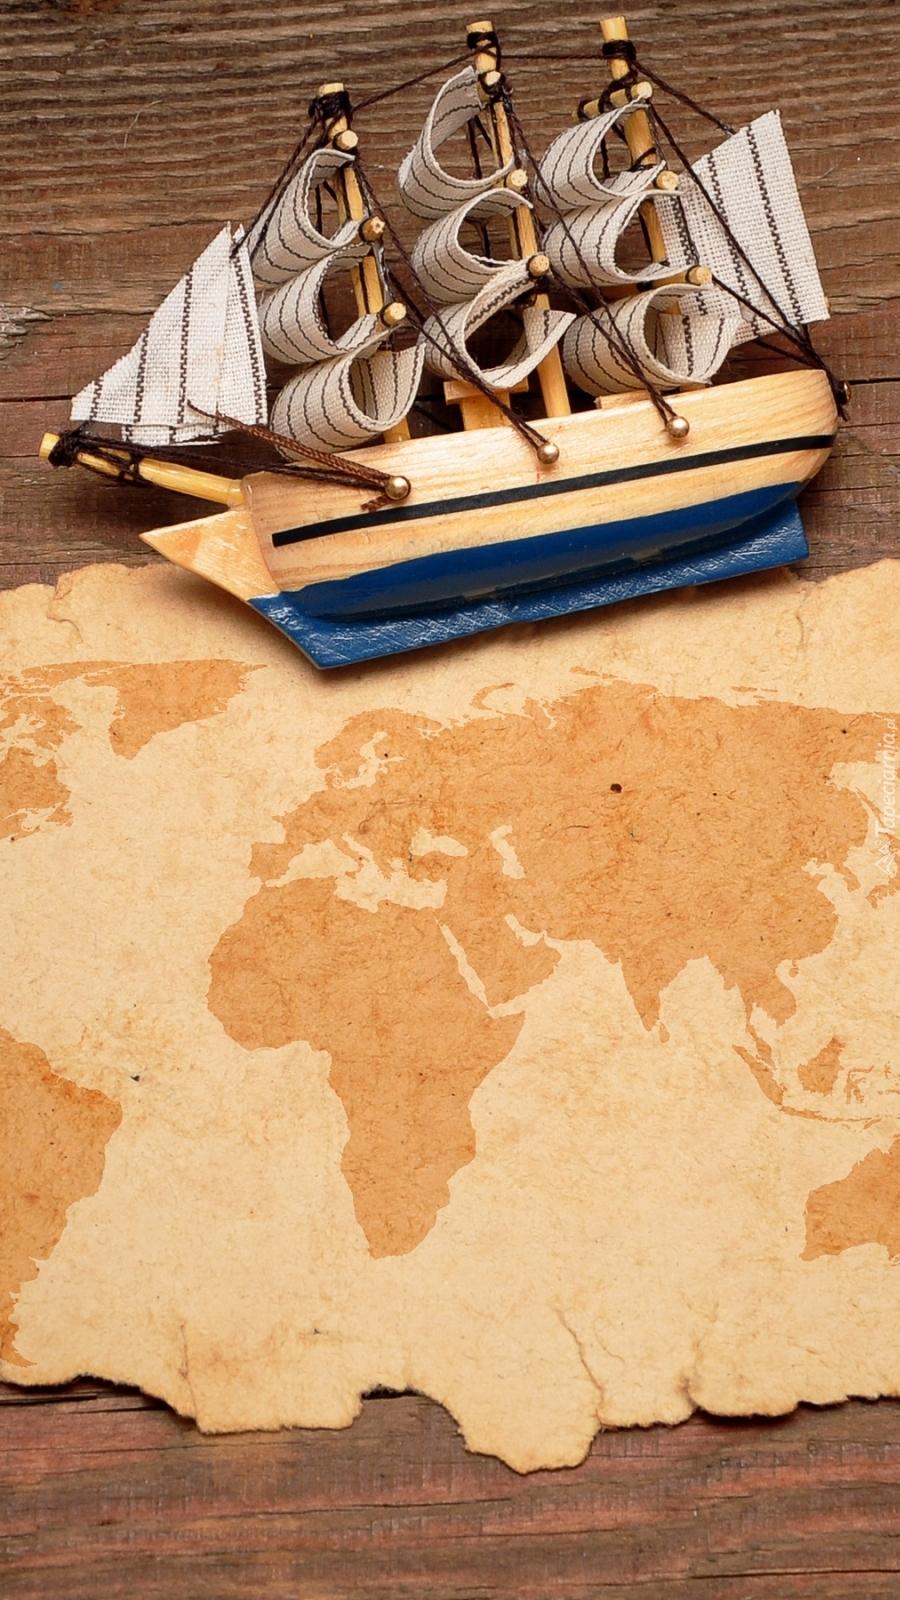 Statek na mapie